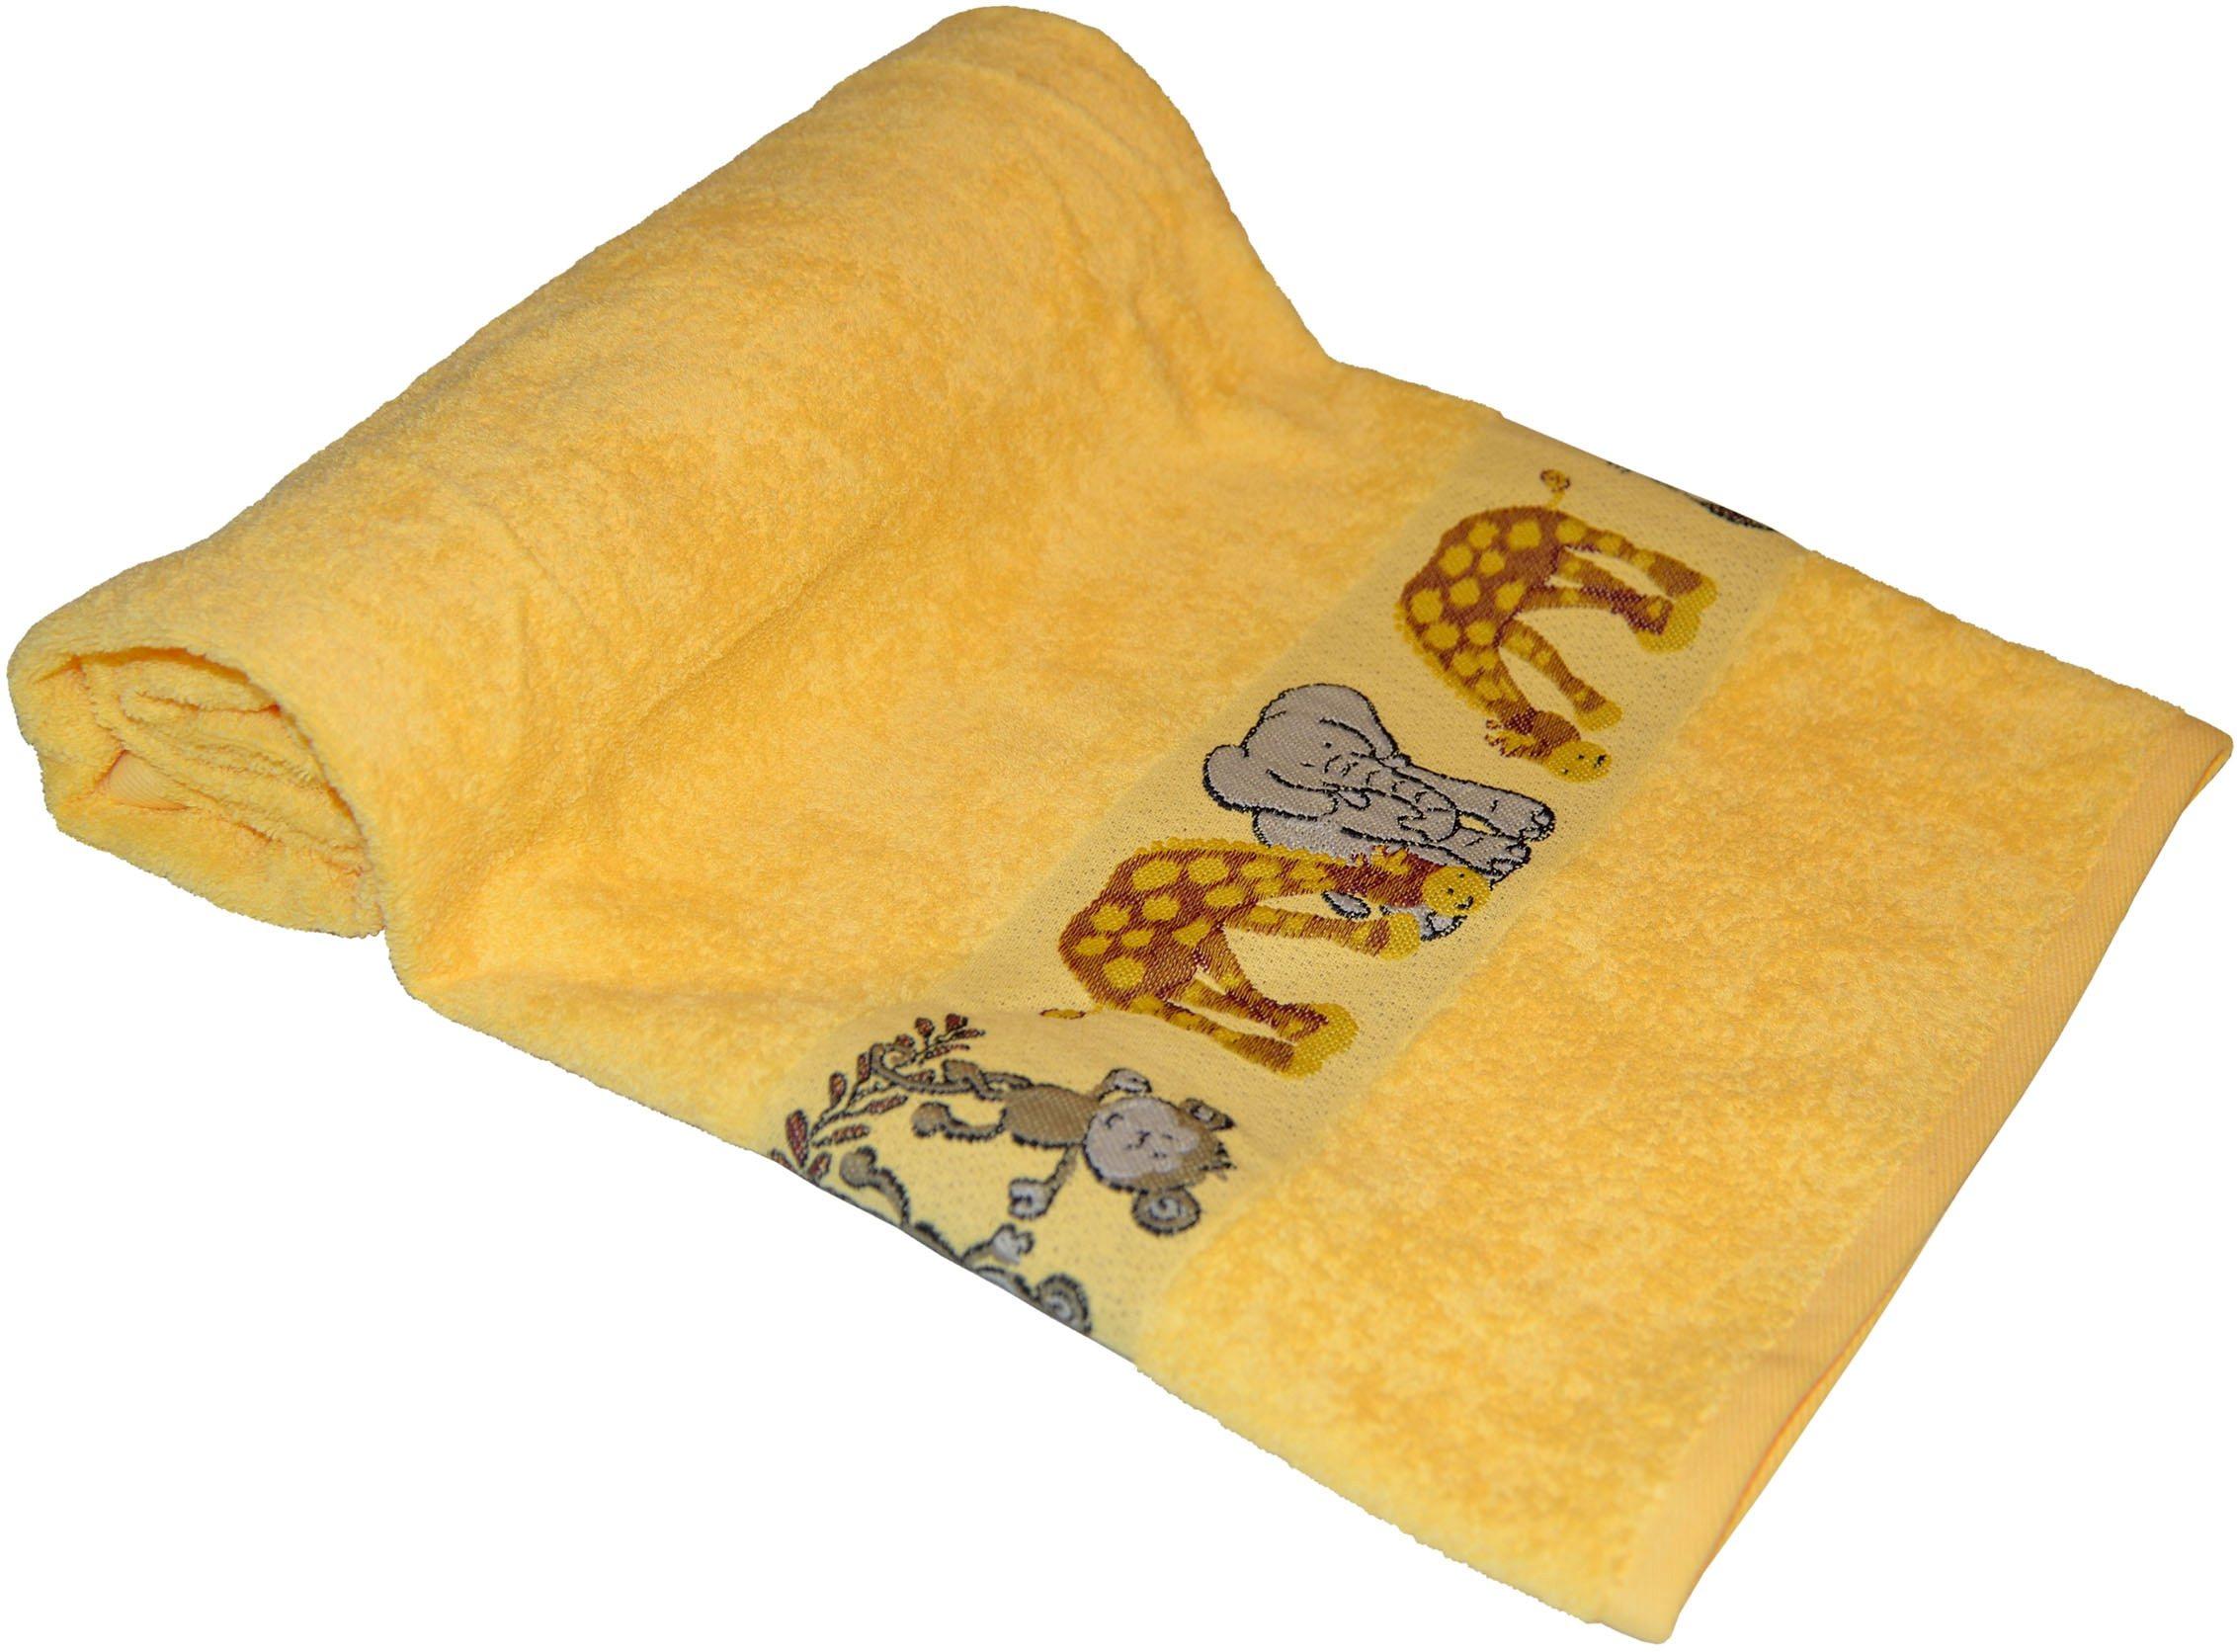 Badetuch, Dyckhoff, »Affe«, mit Tierbordüre | Bad > Handtücher > Badetücher | Dyckhoff